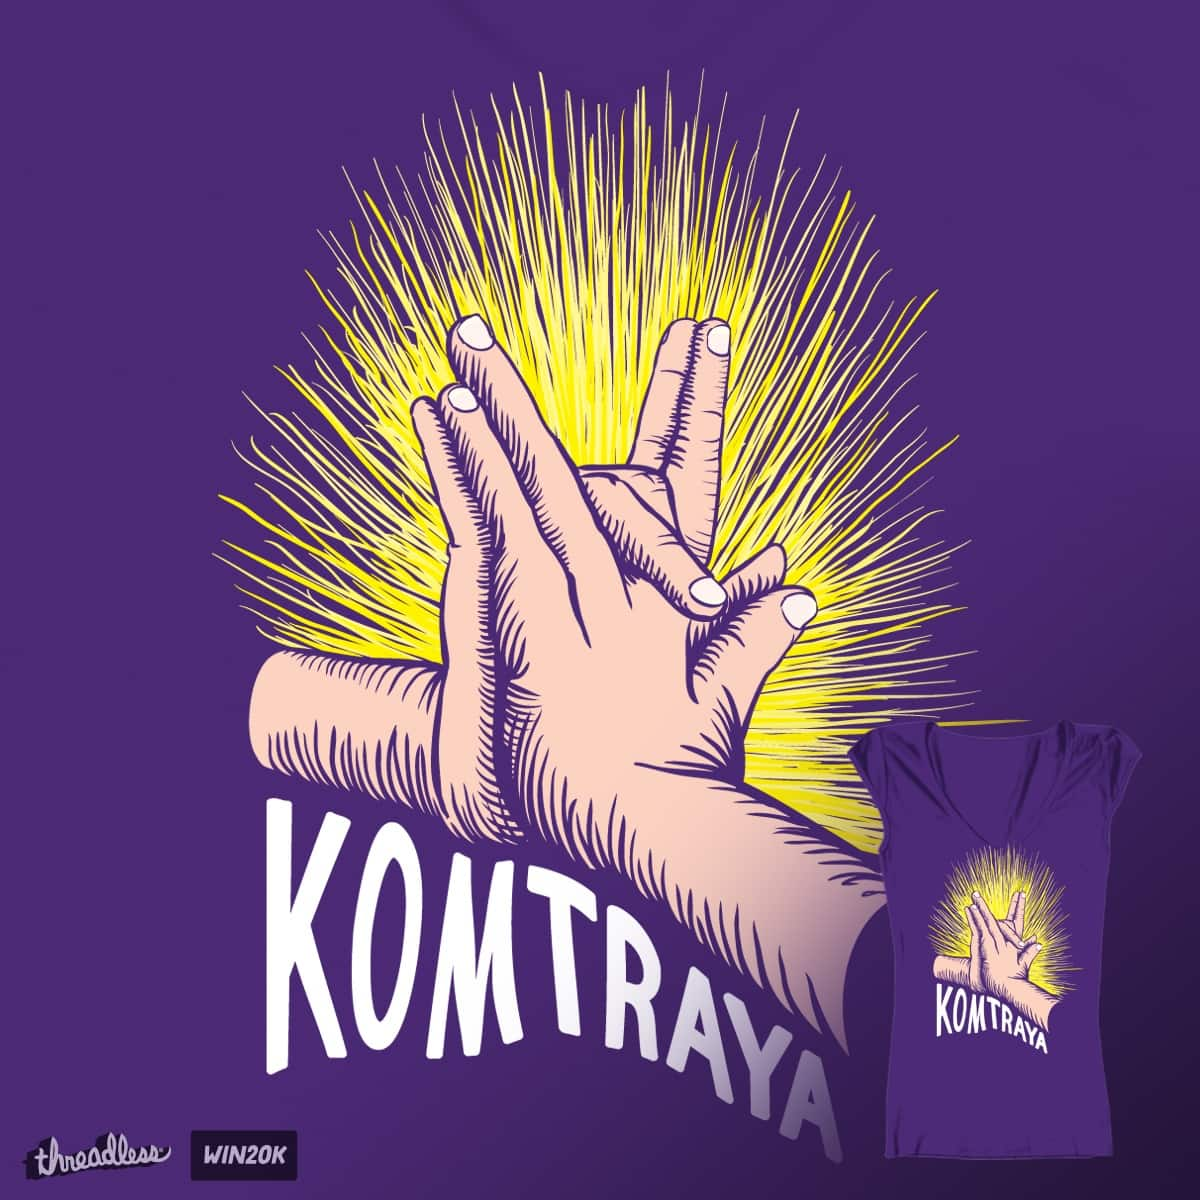 Komtraya by jvervaeck on Threadless